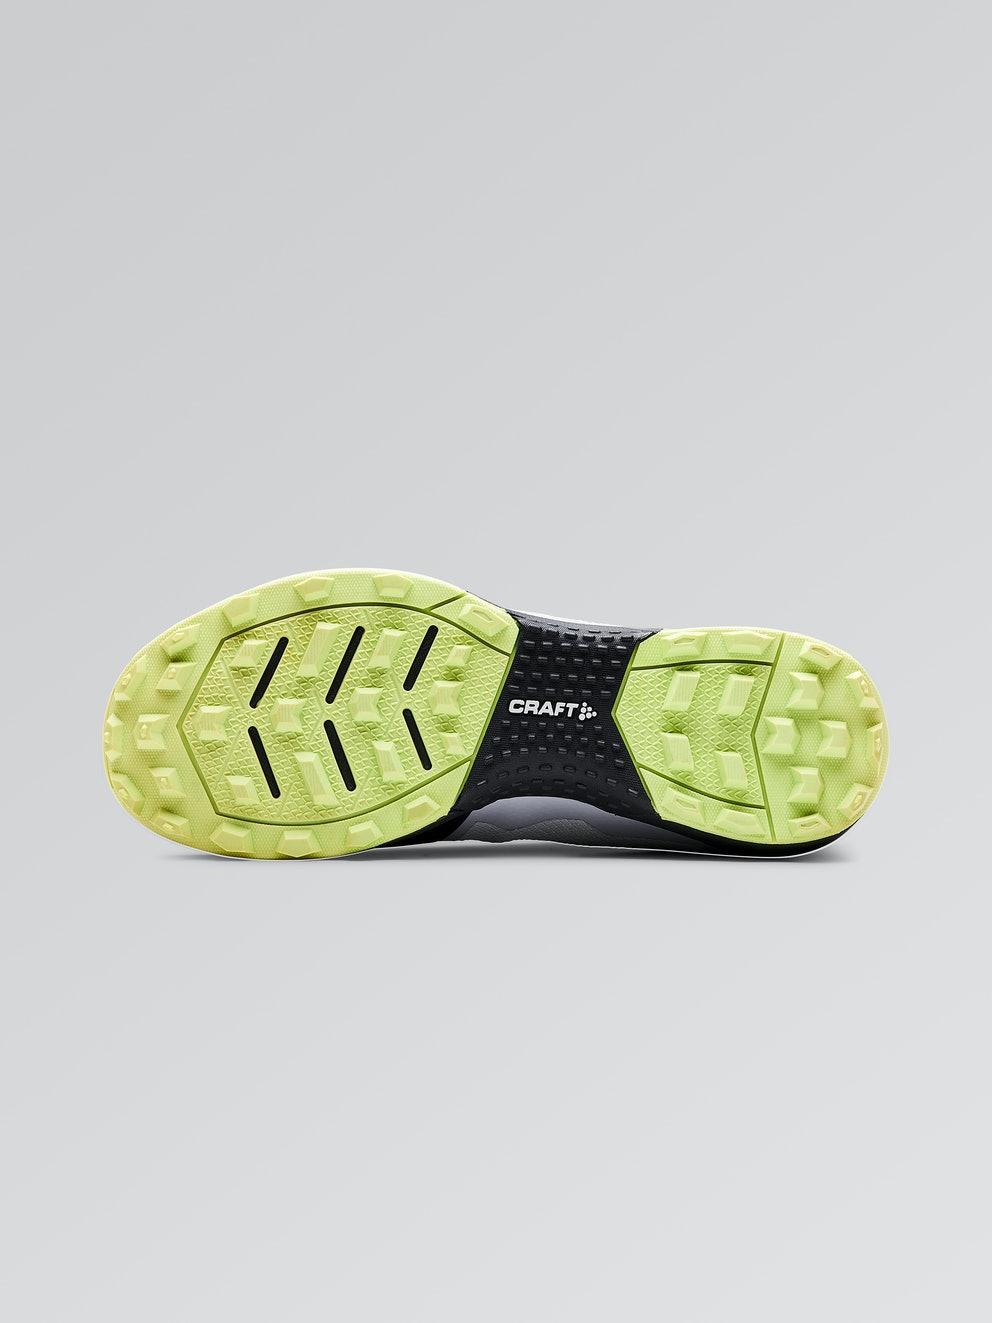 craft ocr ctm speed chaussure trail 4